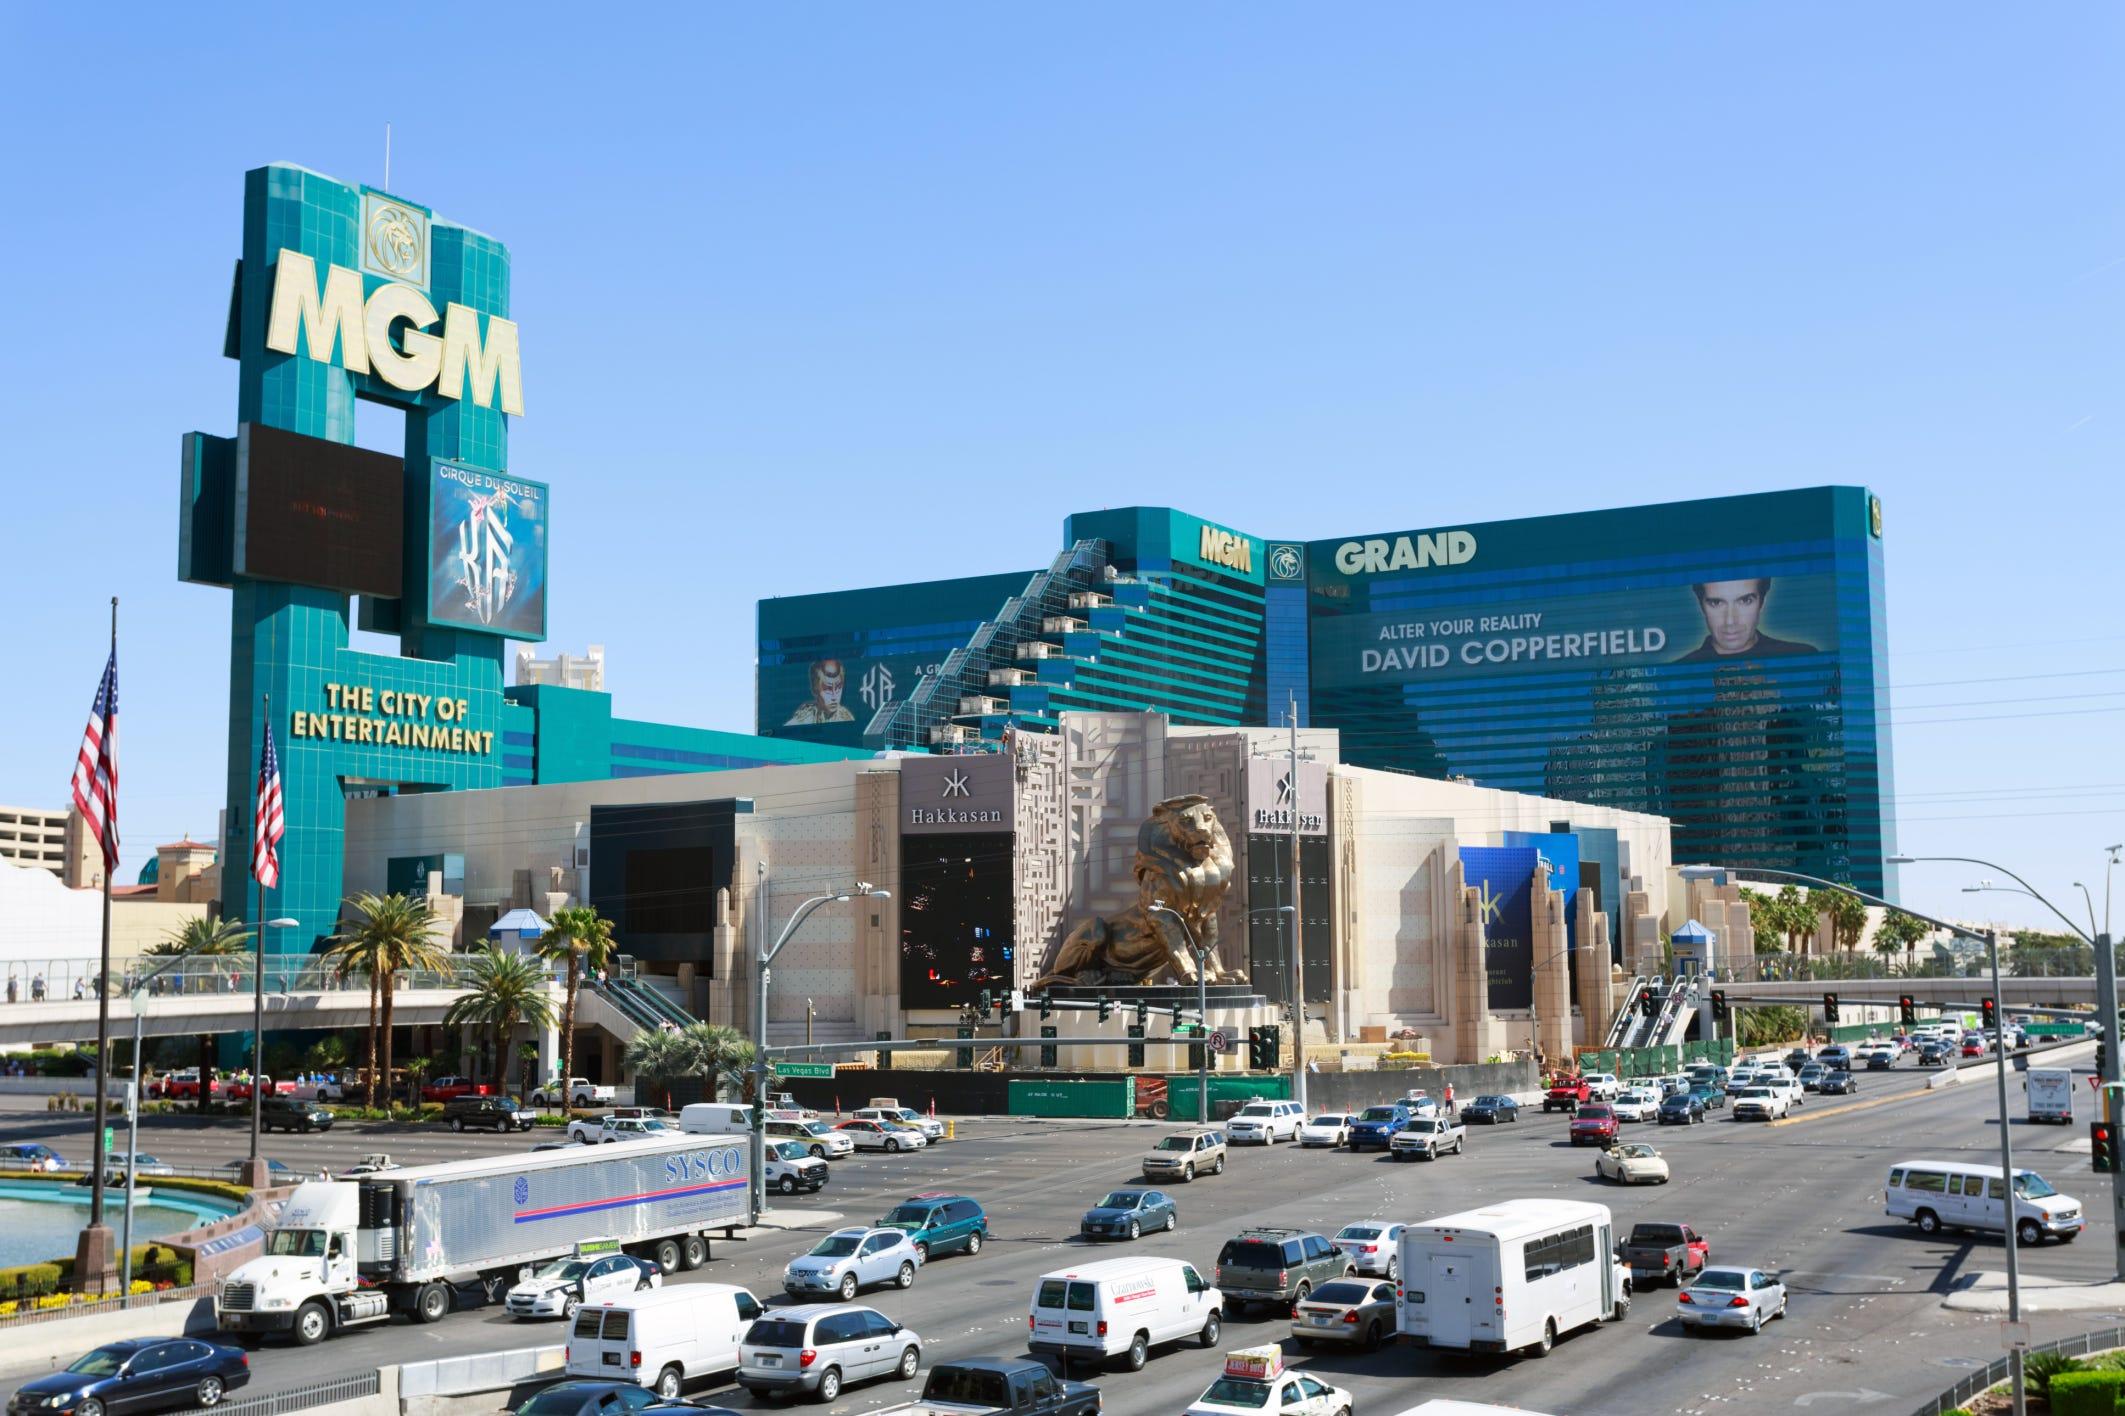 Mgm grand hotels and casino free bet casino no deposit